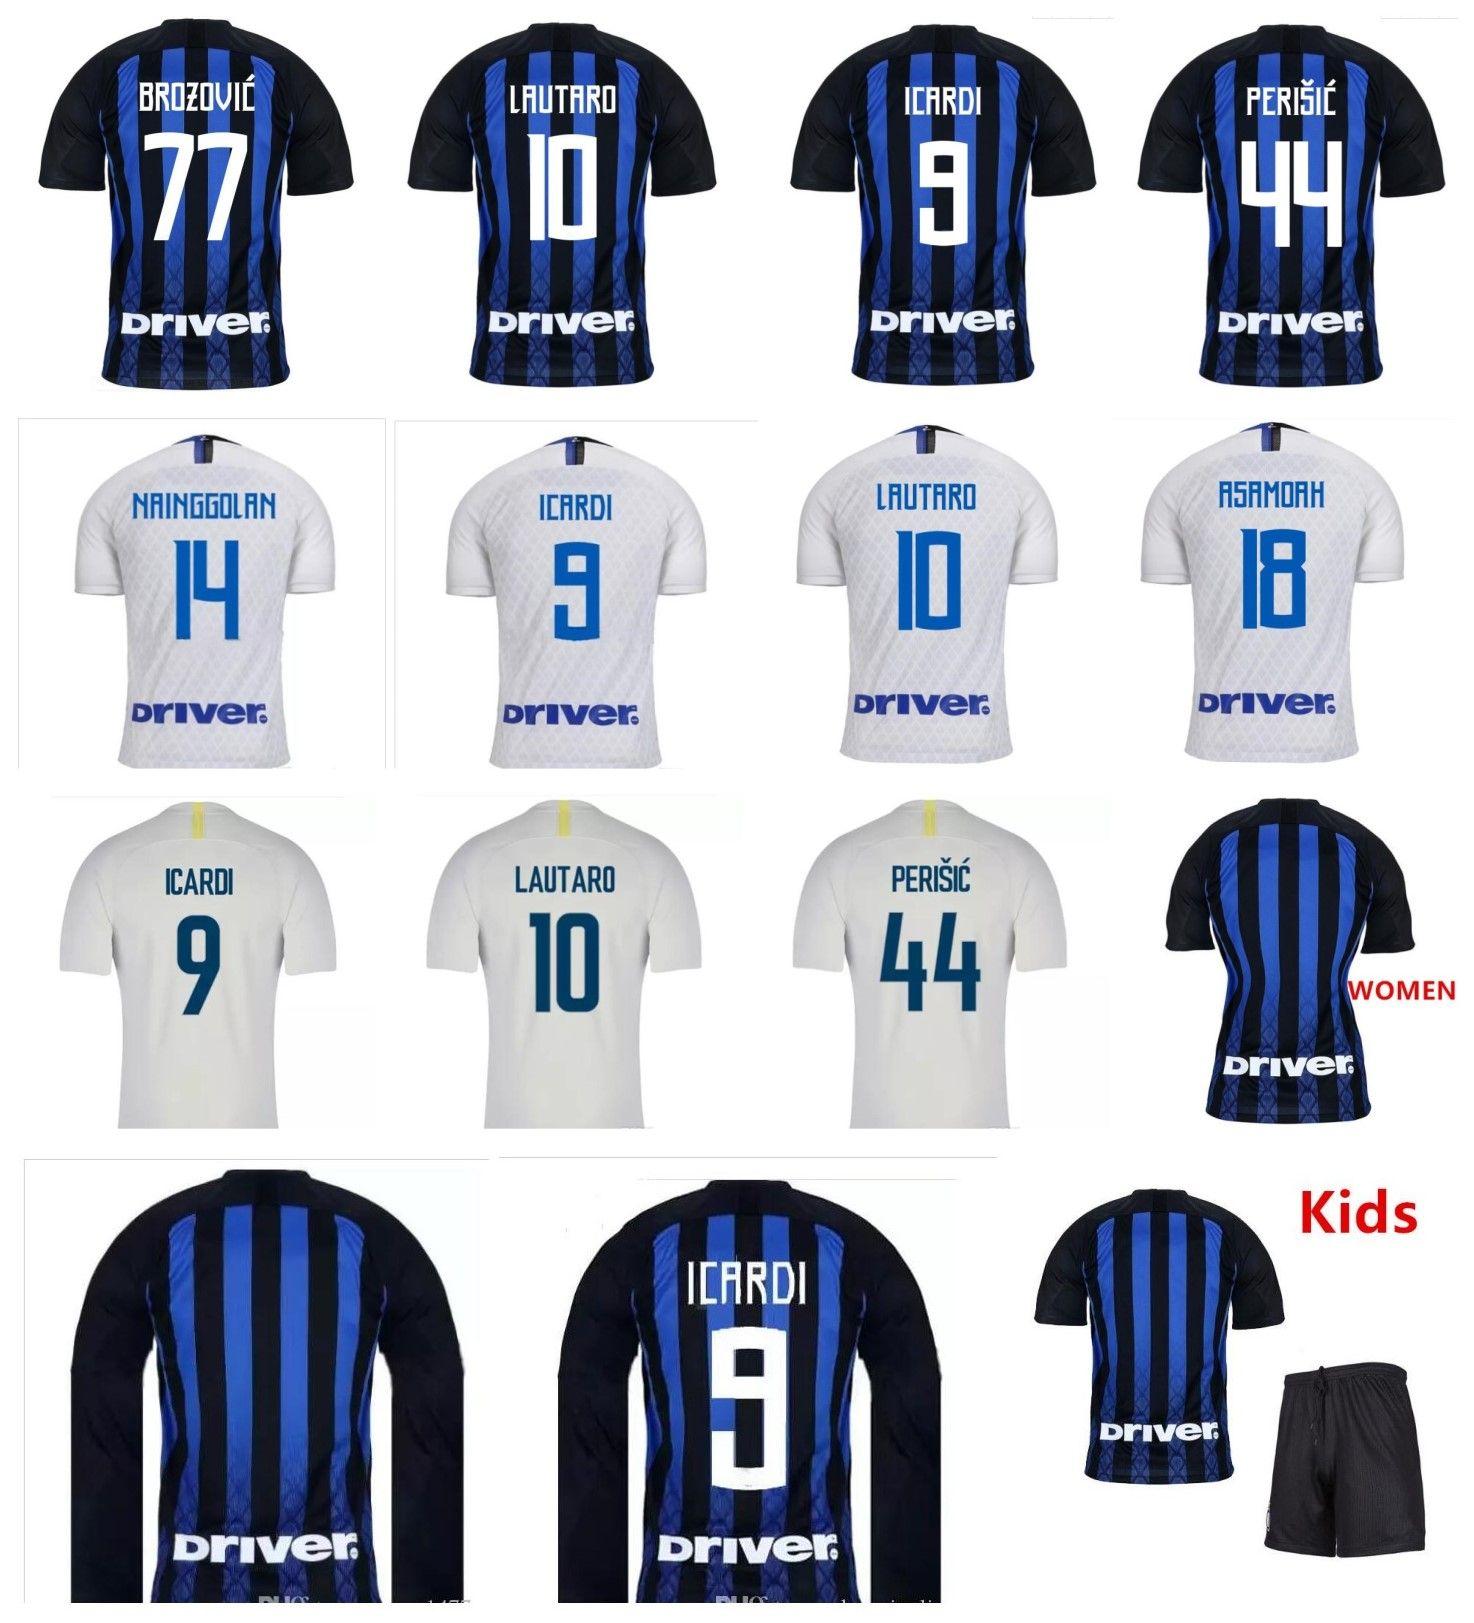 72c8bb4b2 2019 New Top Thai 2019 Inter Jersey 18 19 Soccer Jersey MilAn Football Shirt  ICARDI Uniforms PERISIC Nainggolan Lauturo Skriniar 2018 Kids Kits From ...